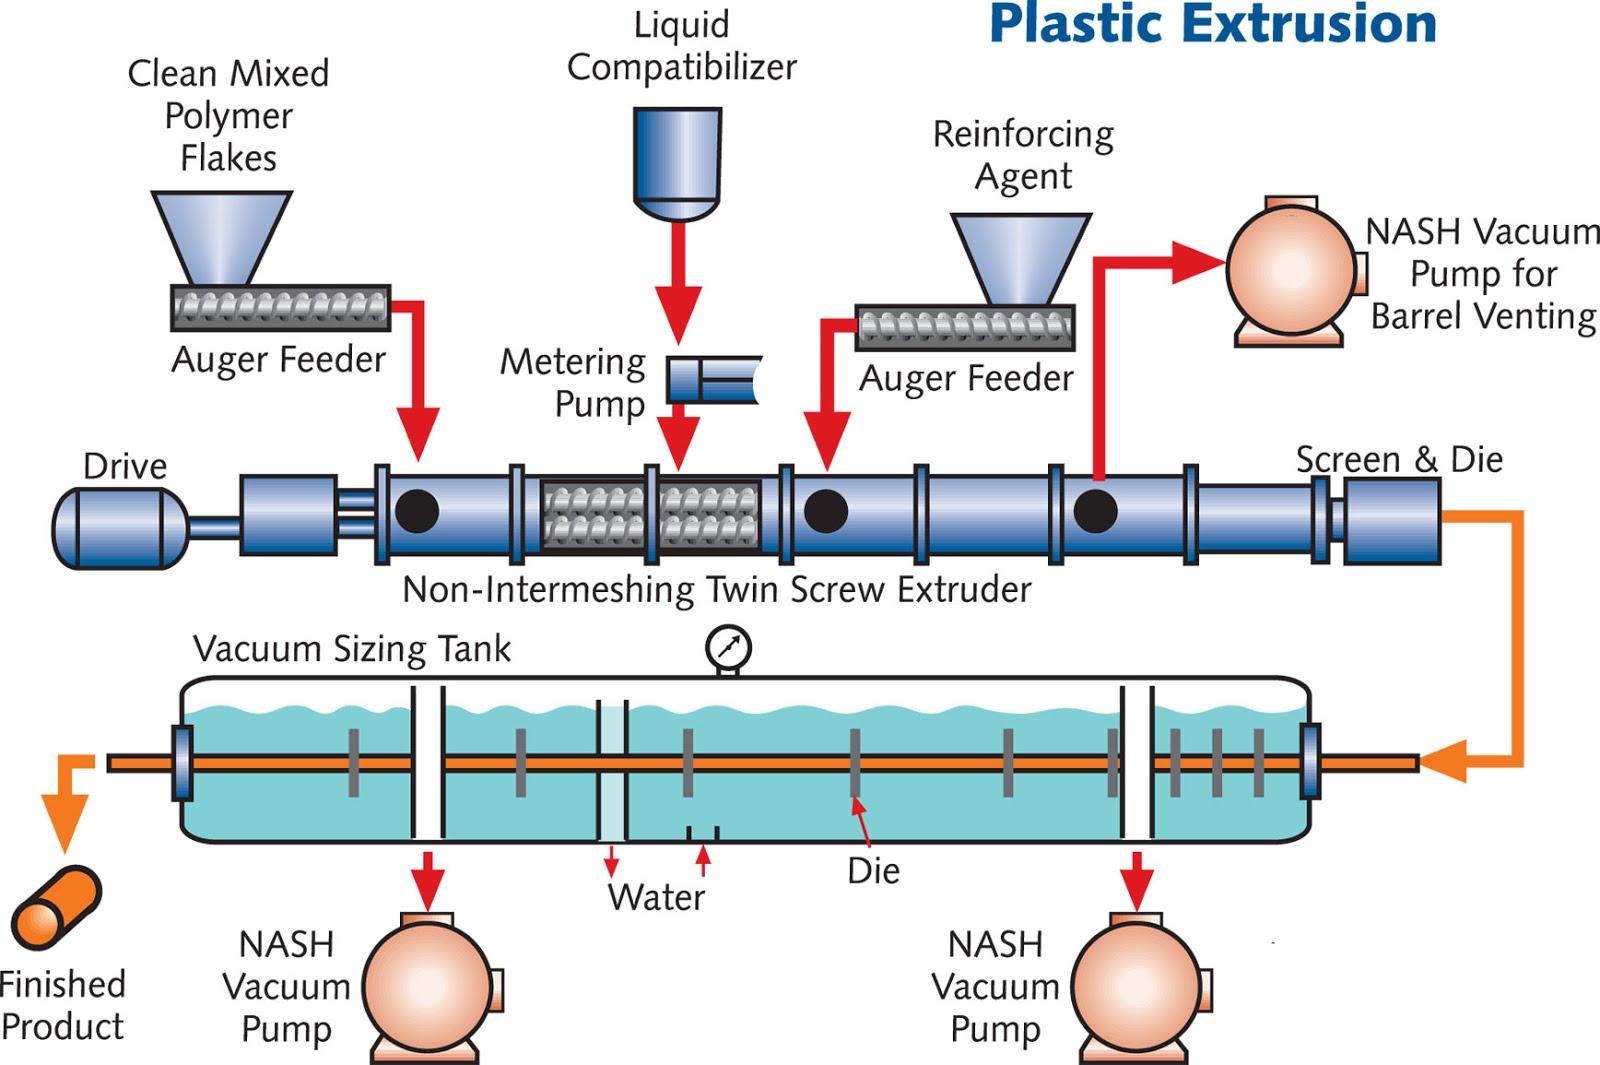 Tire Machine Parts >> Plastic Extrusion - MechanicsTips